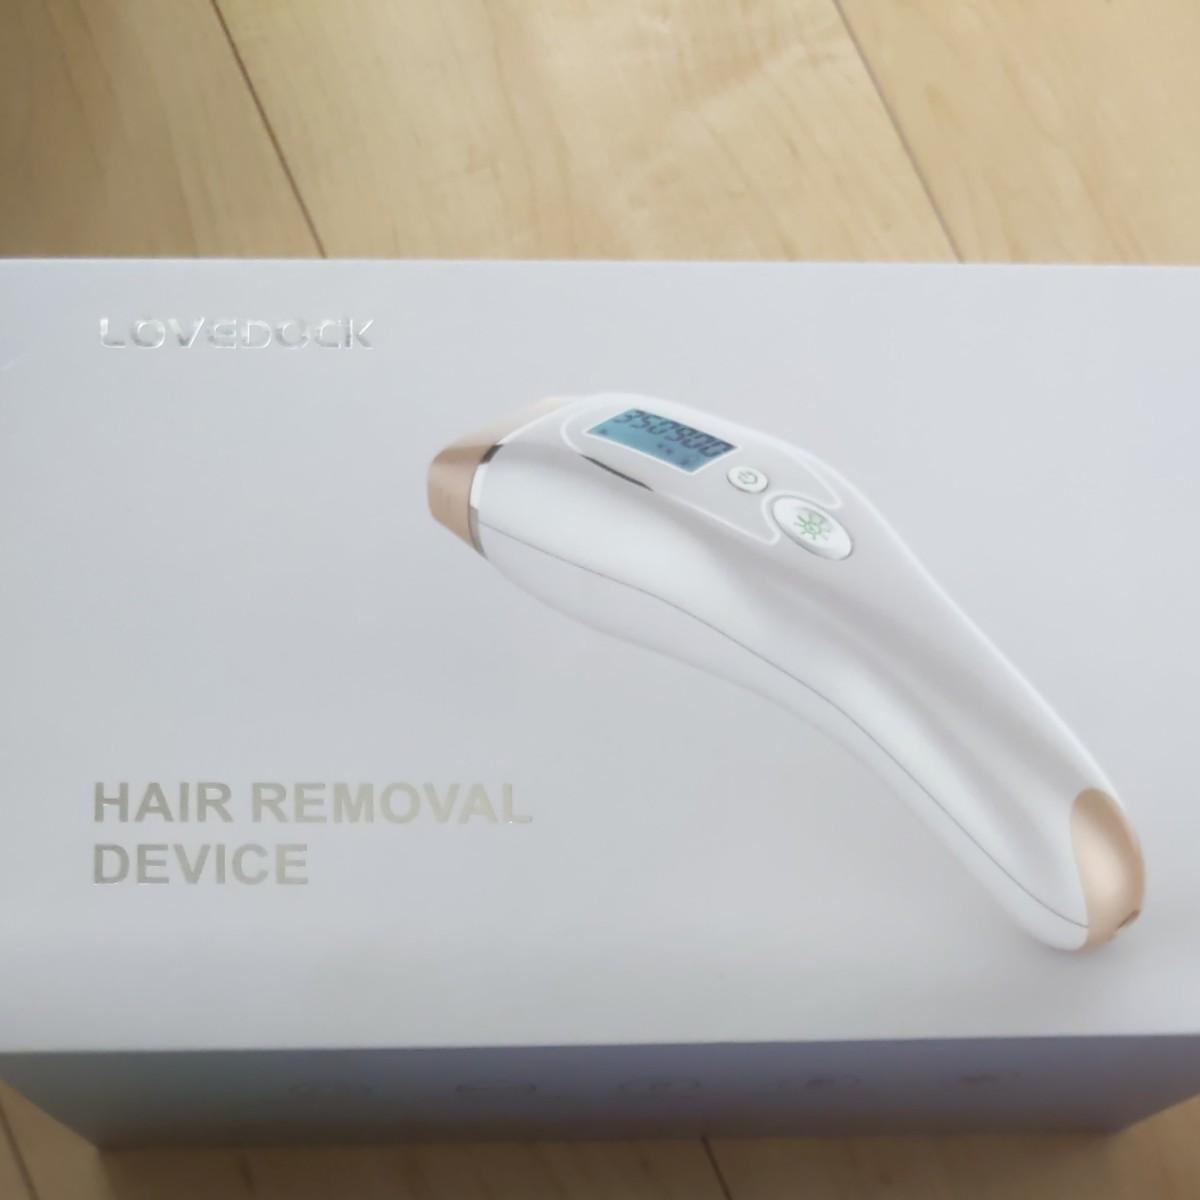 家庭用脱毛器 LOVEDOCK HAIR REMOVAL DEVICE